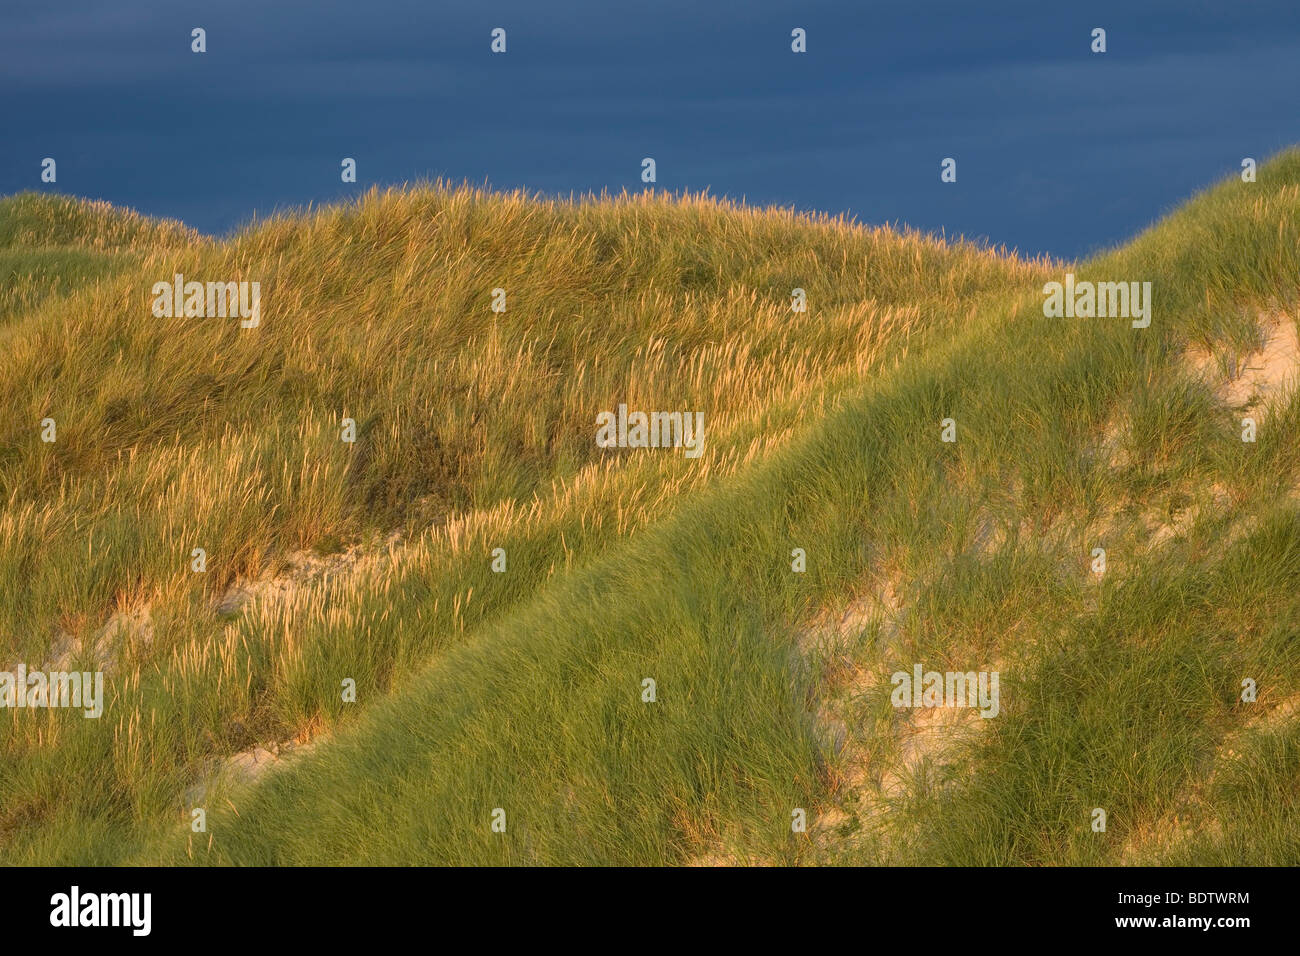 Duenenlandschaft / Dune (dene) scenery / Jylland - Daenemark Stock Photo